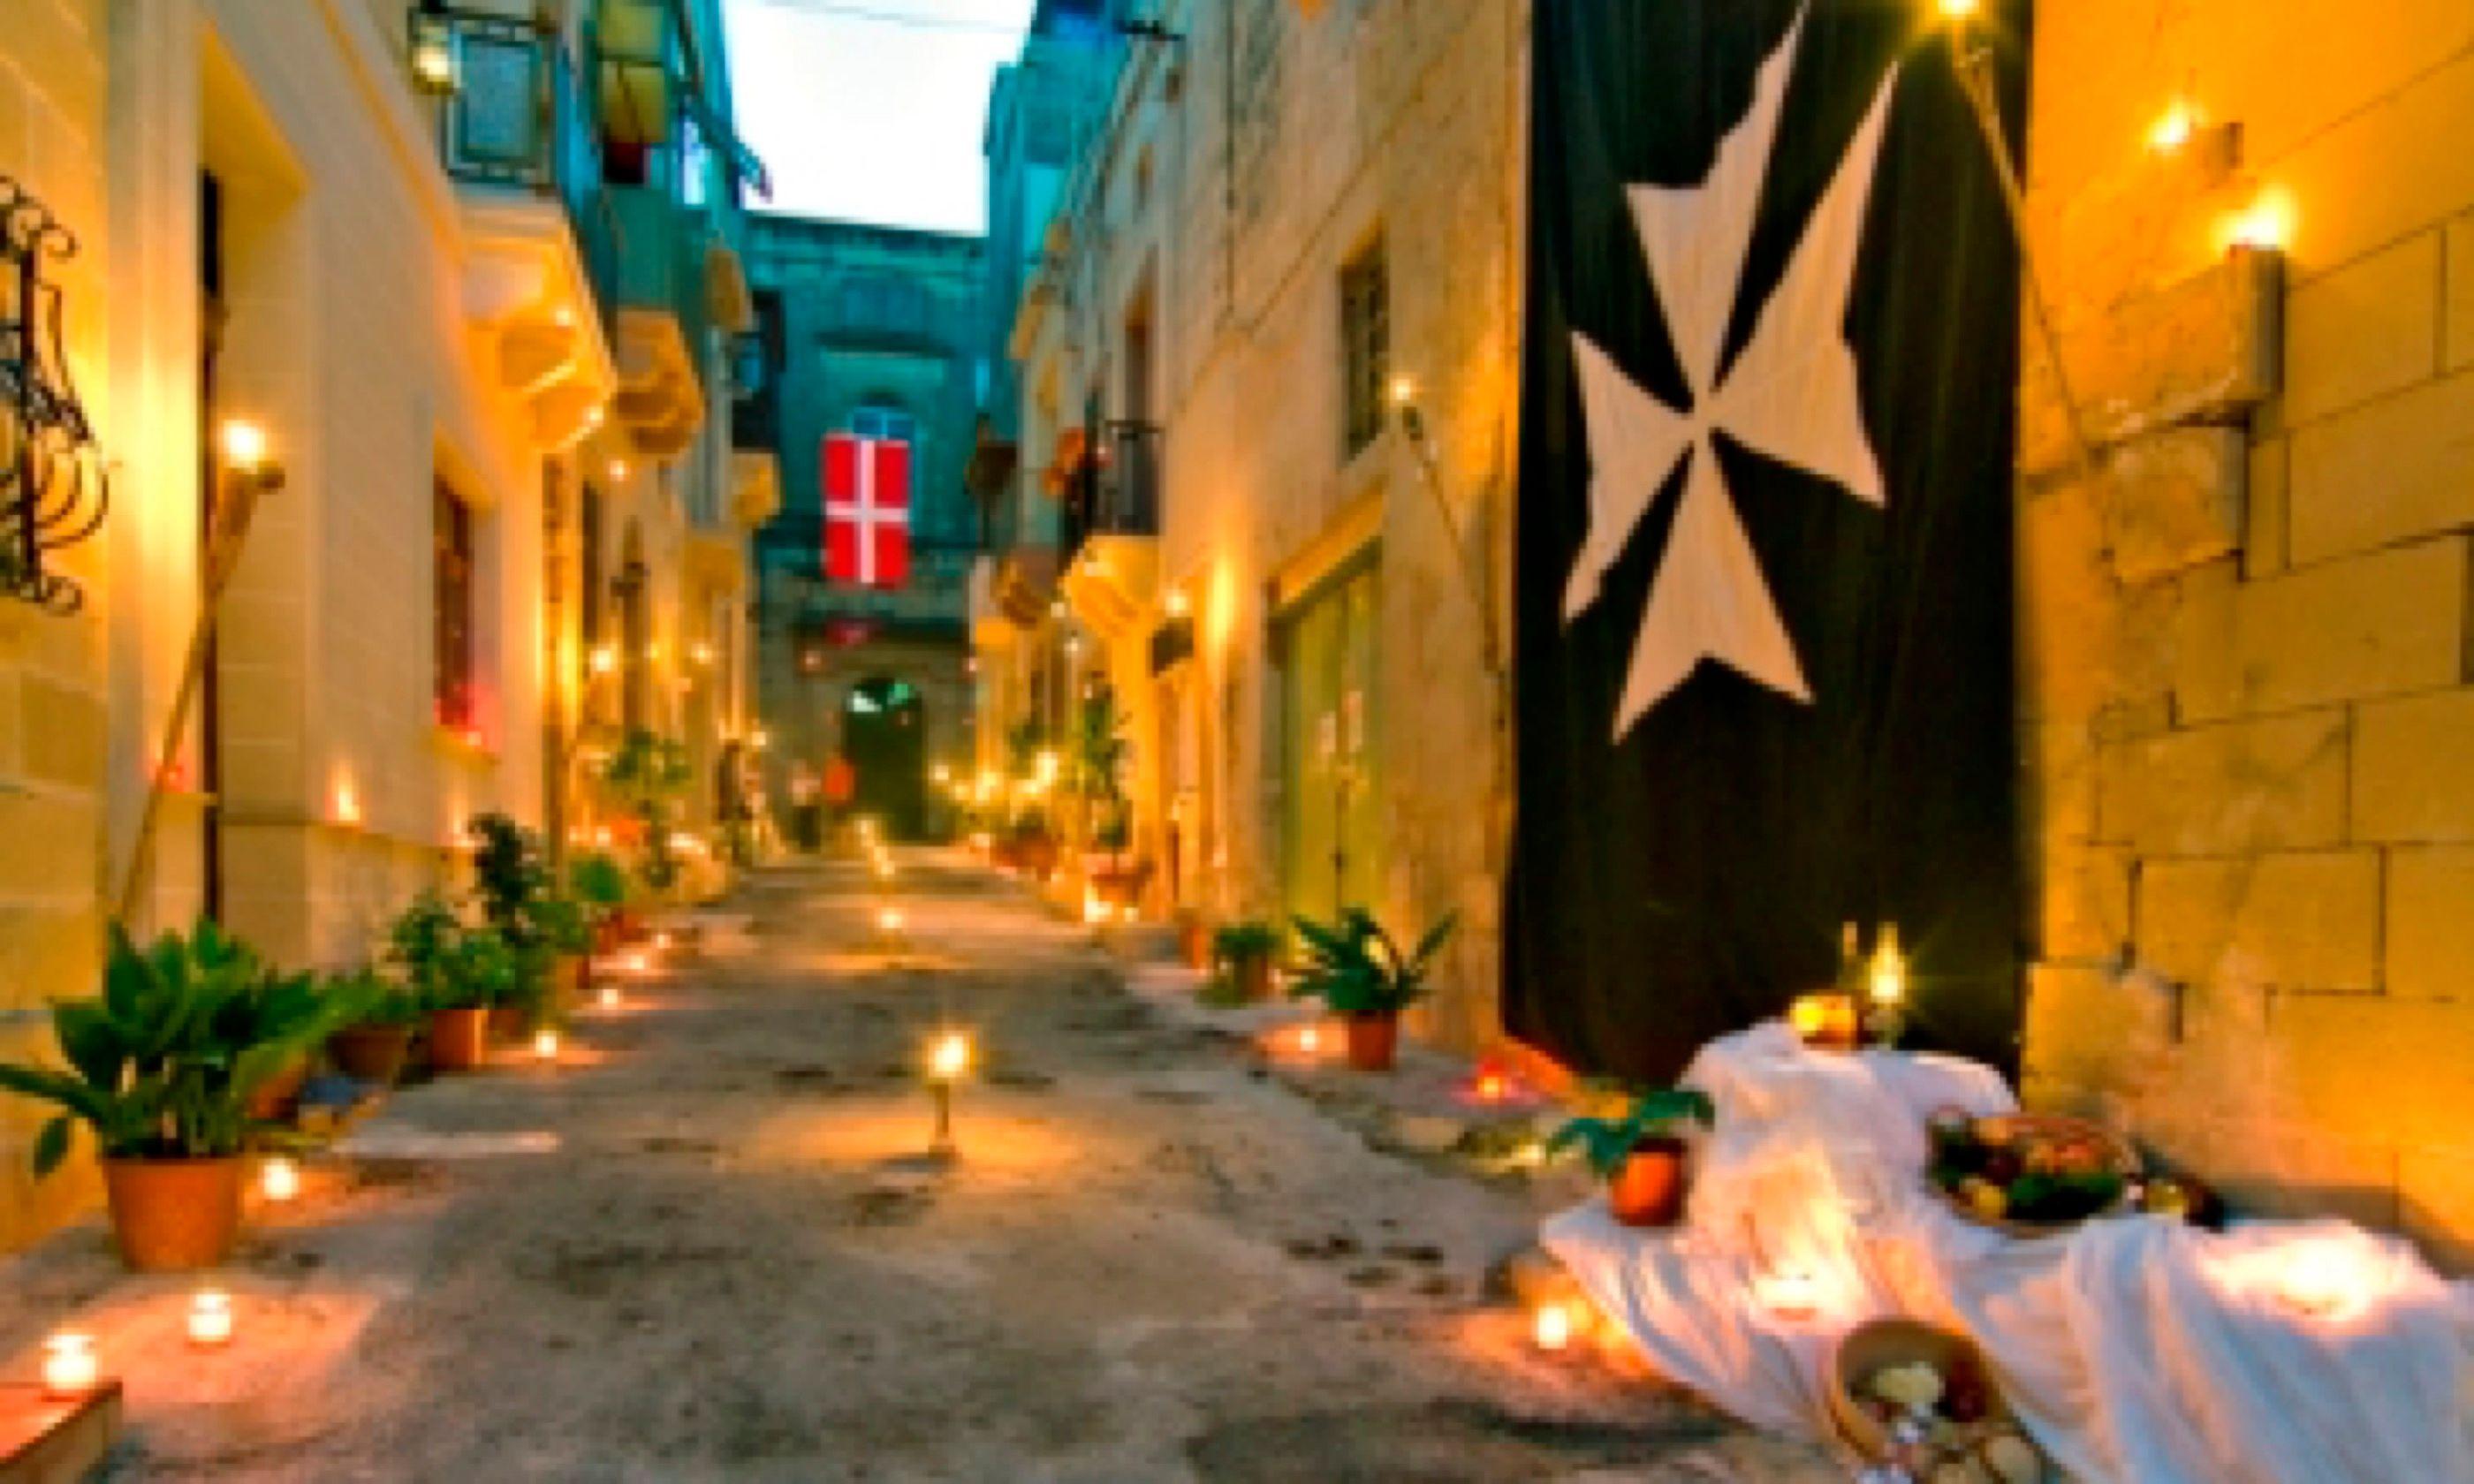 Brig by candlelight (VisitMalta.com)